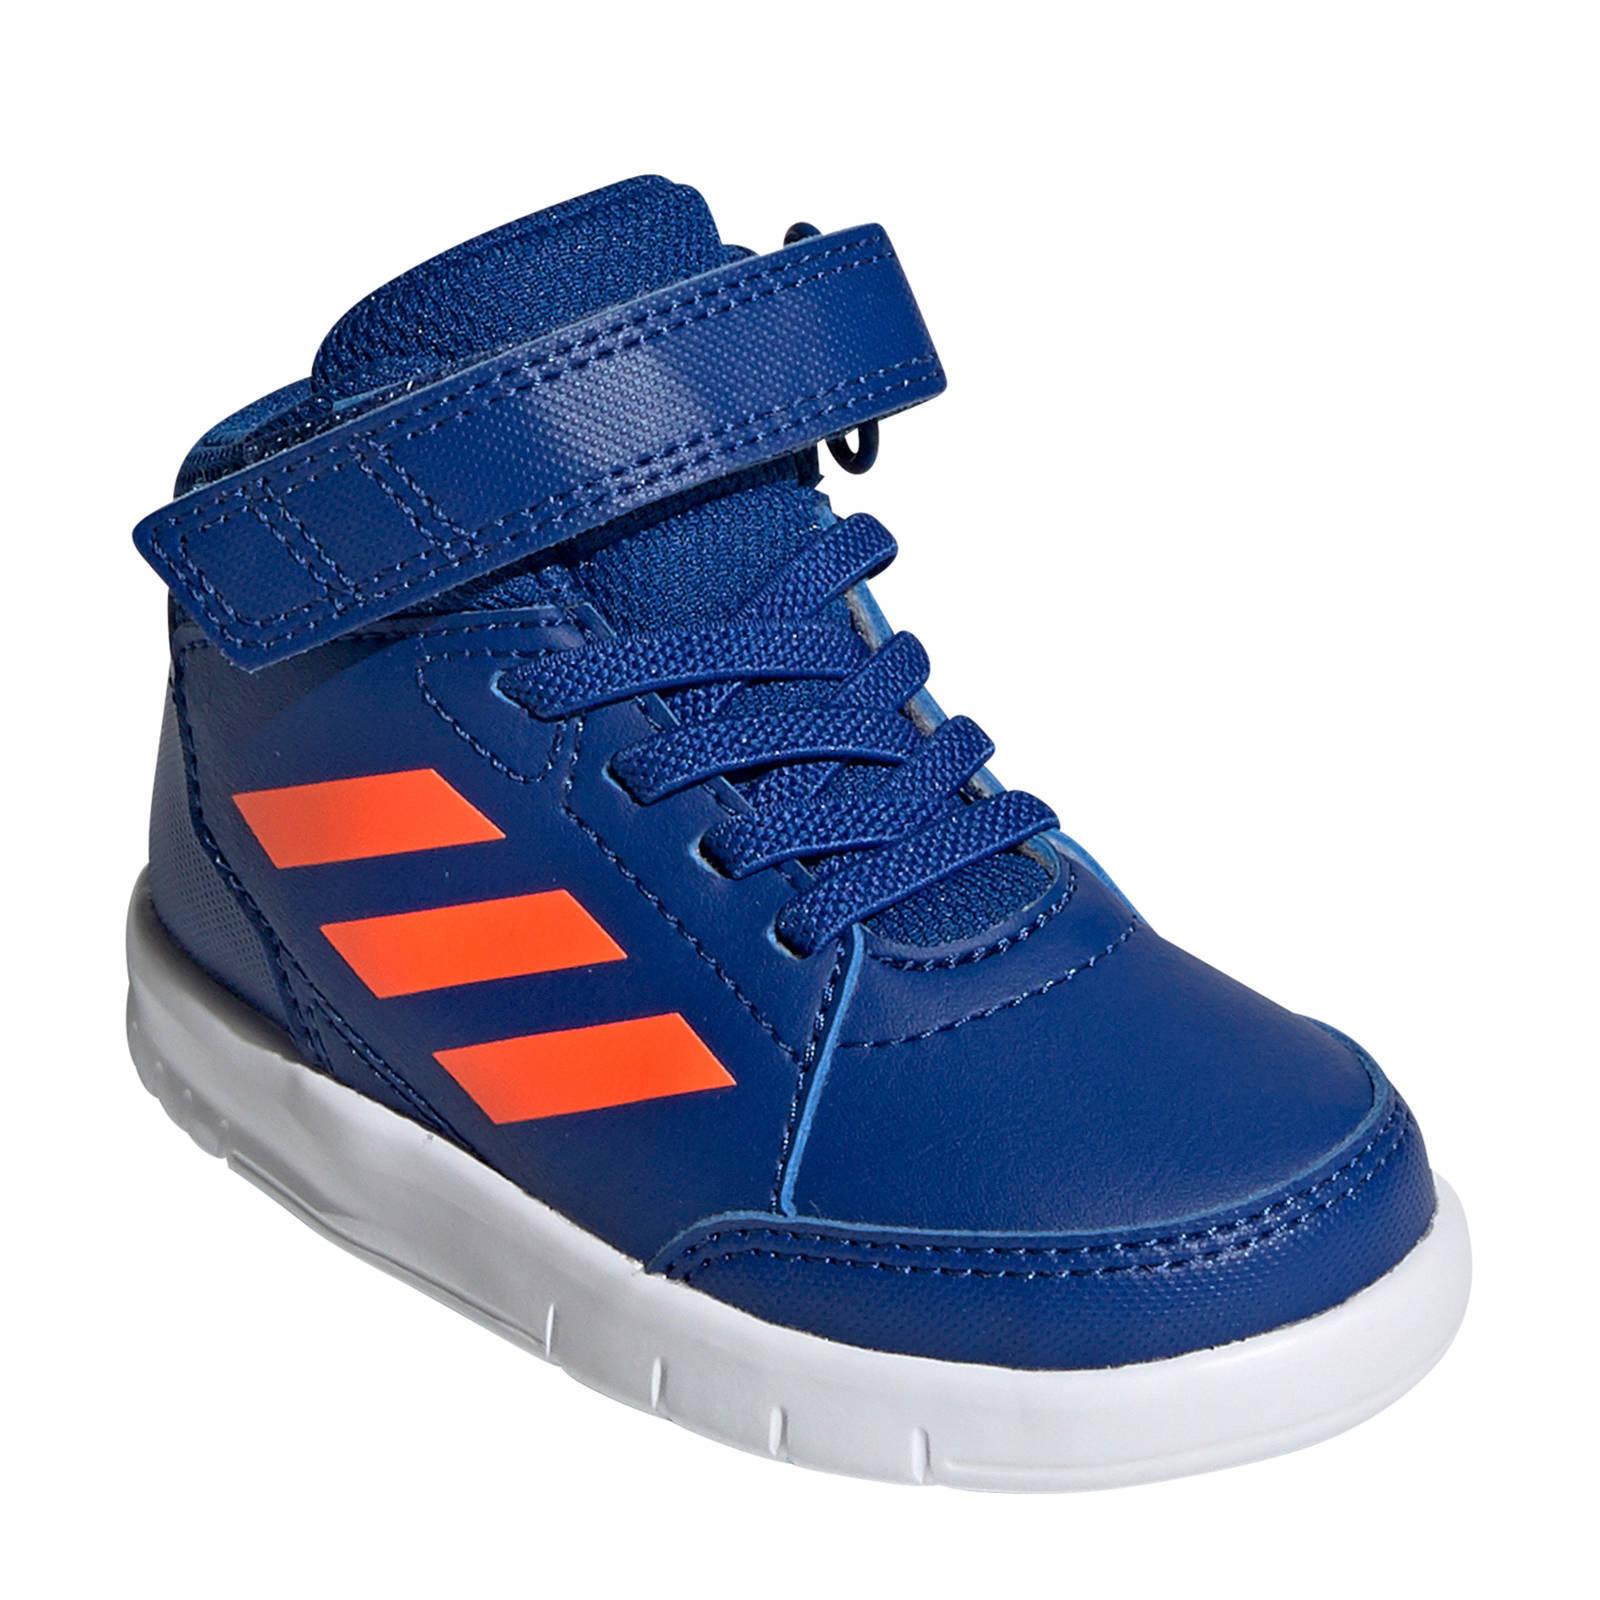 adidas AltaSport Mid I AltaSport Mid I sportschoenen blauw